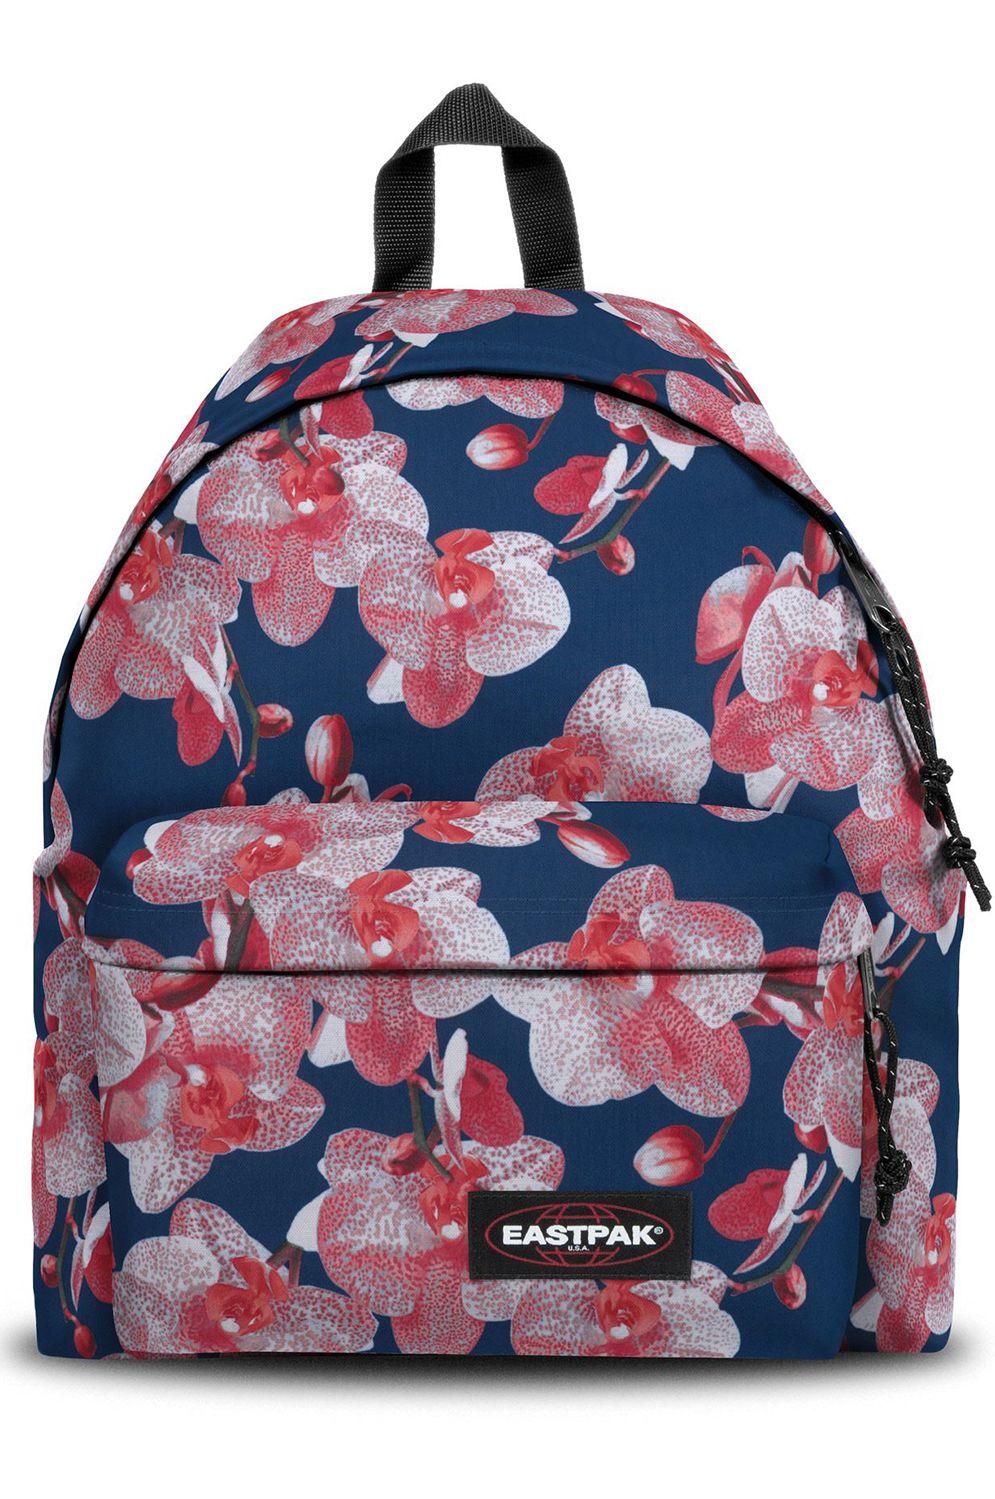 Eastpak Backpack PADDED PAK'R Charming Pink